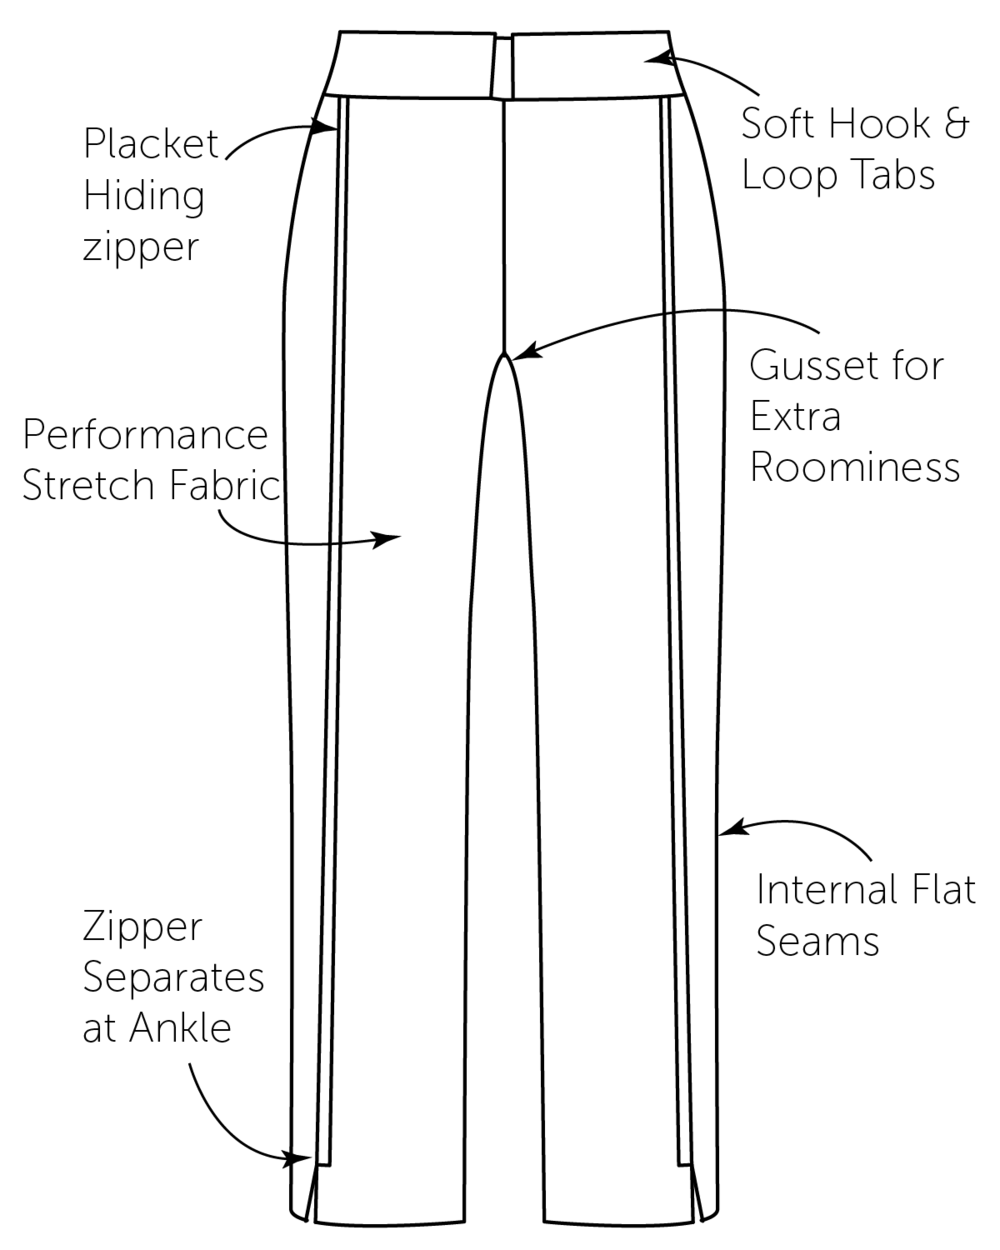 PantStraightSketch-02-01.png